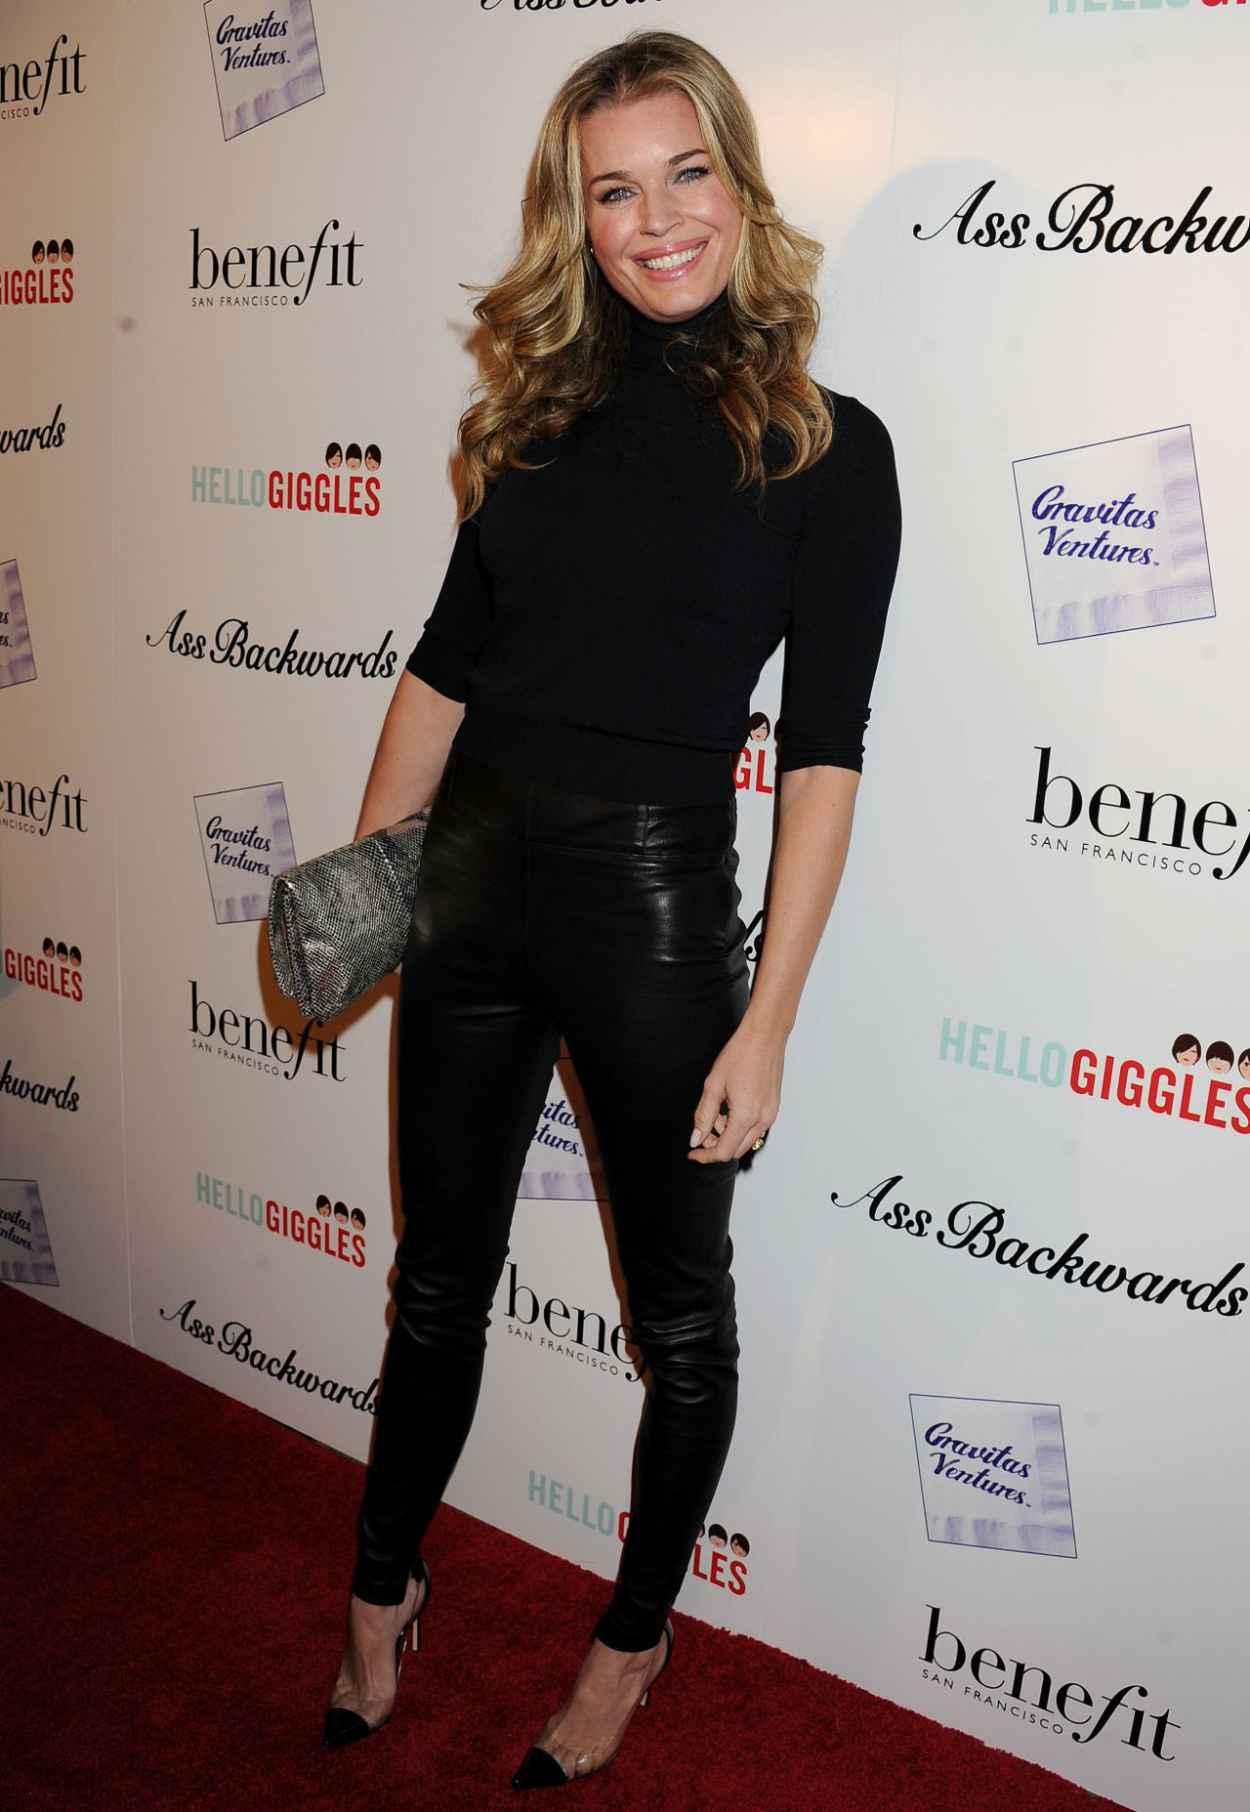 Rebecca Romijn on Red Carpet - ASS BACKWARDS Movie Premiere-1